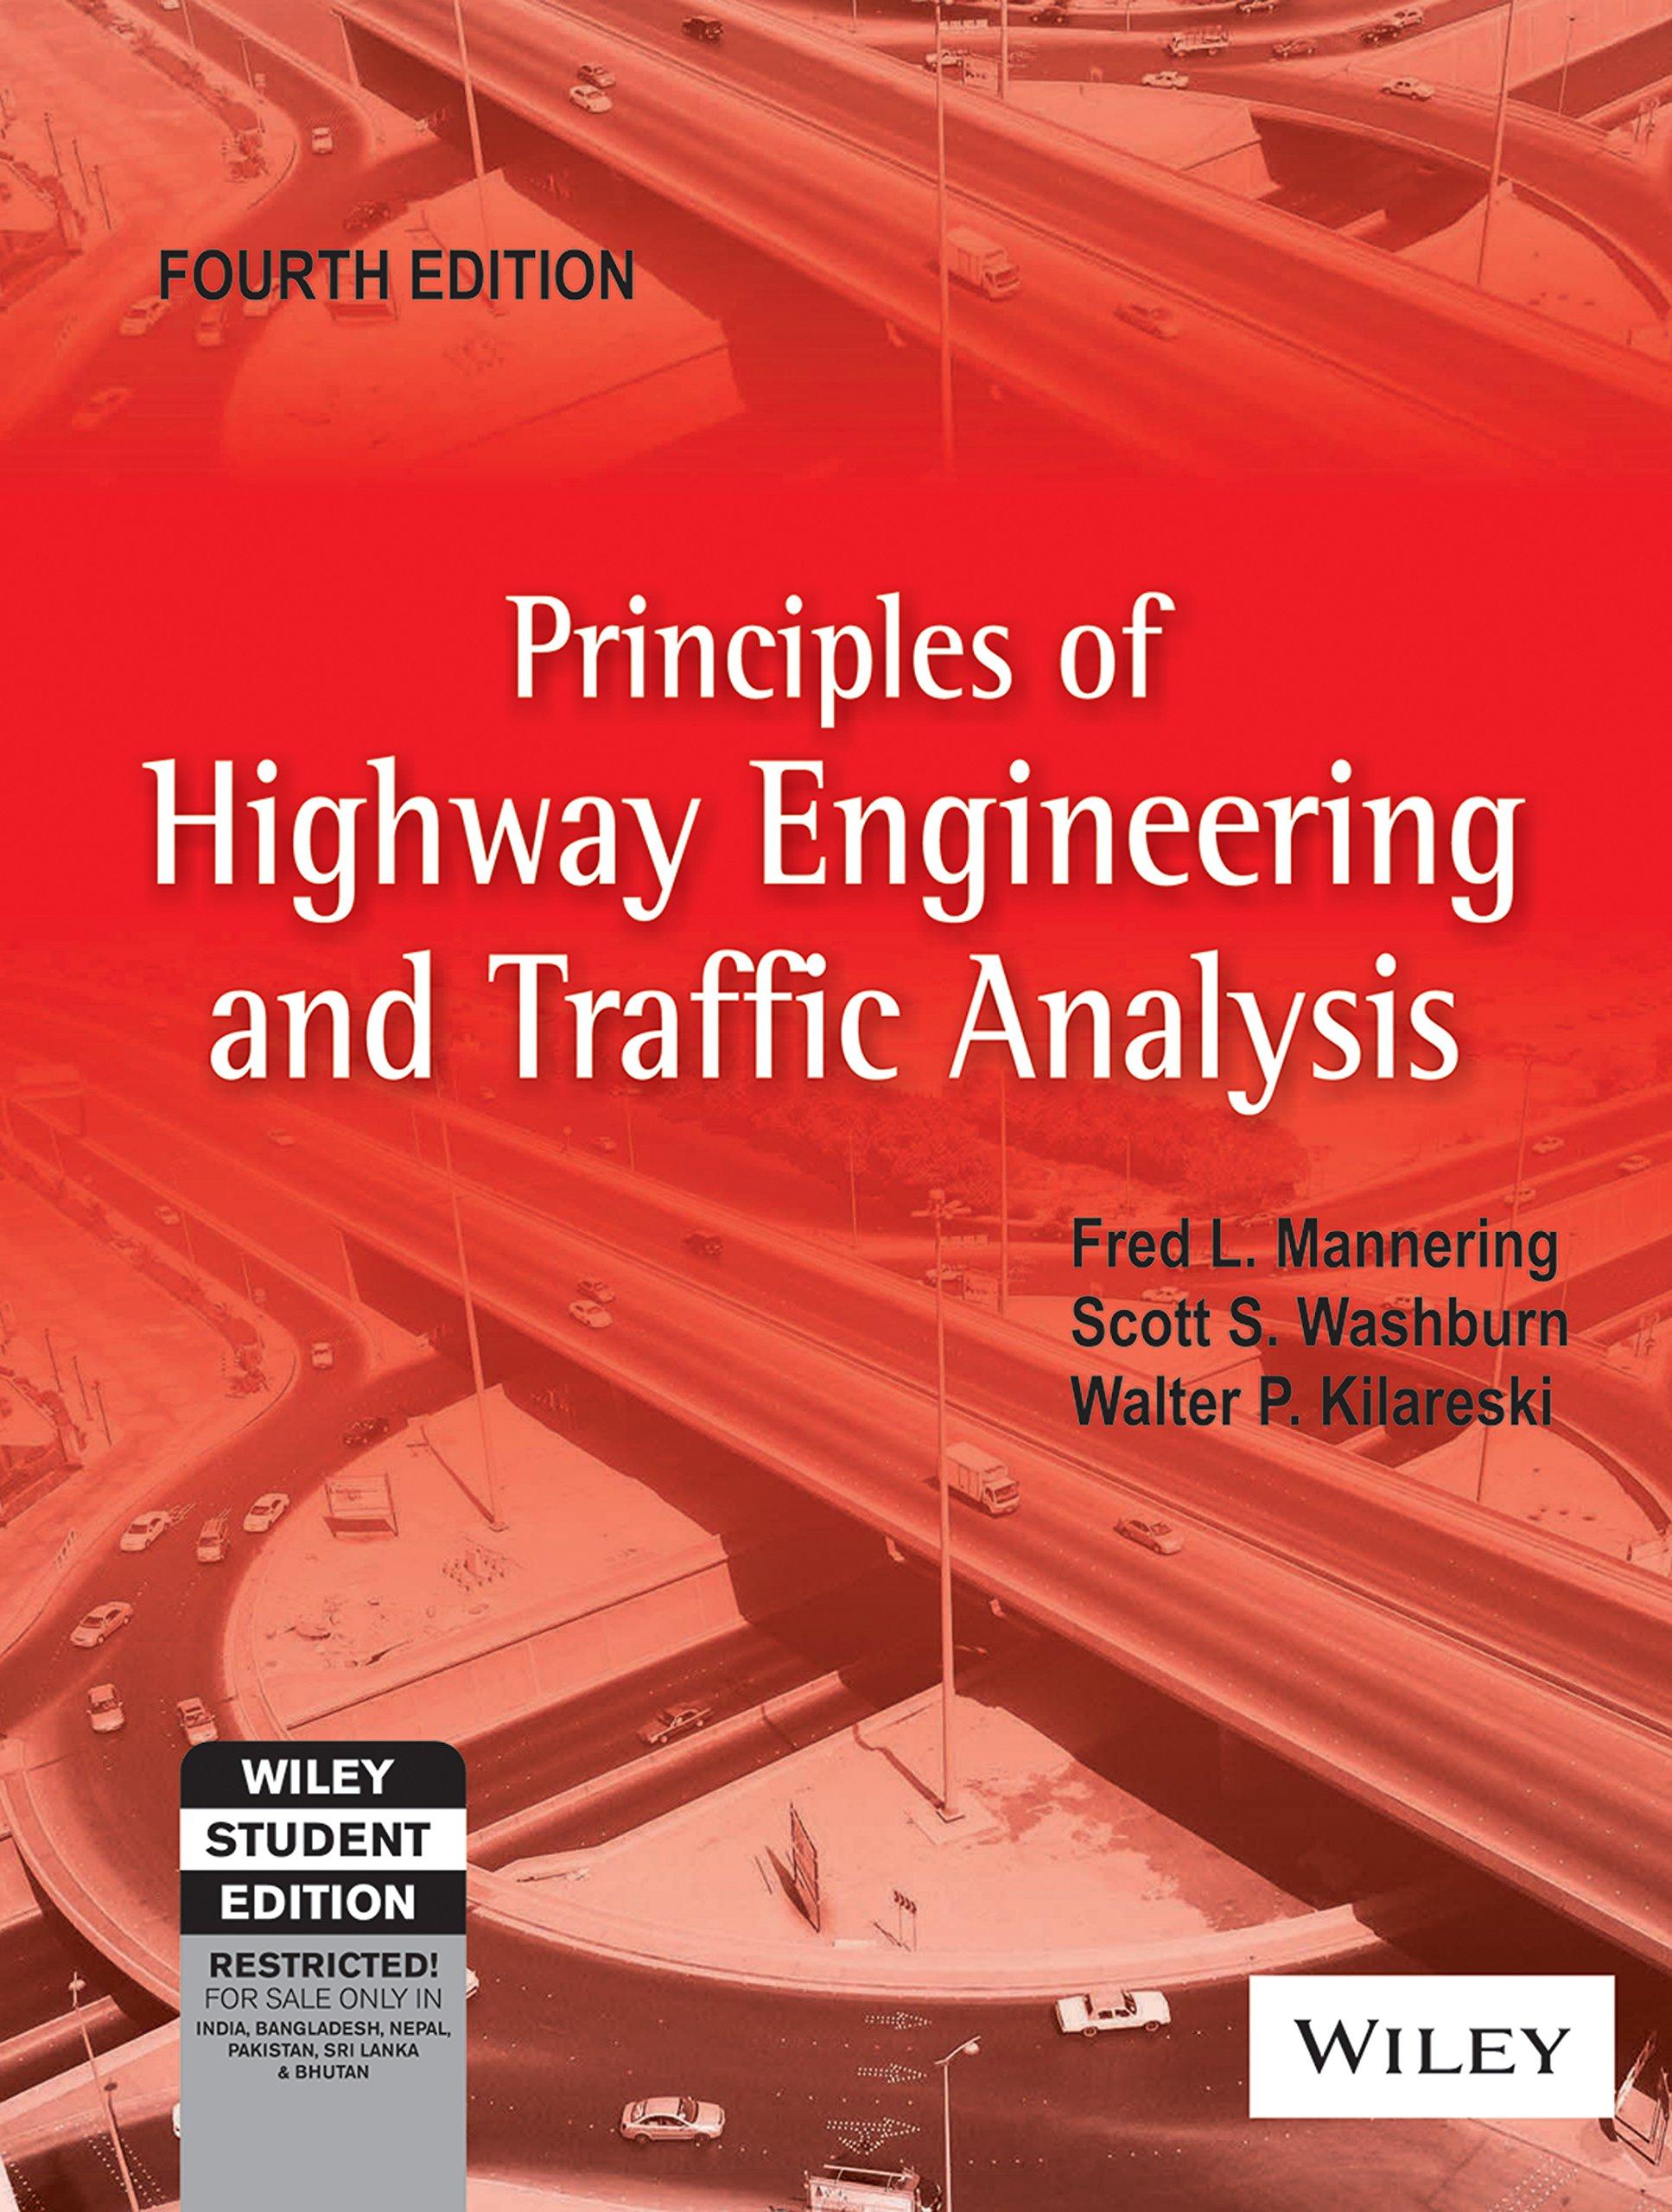 Principles of Highway Engineering and Traffic Analysis 4th Edition  (International Version): Fred L. Mannering, Scott S. Washburn, Walter P.  Kilareski: ...